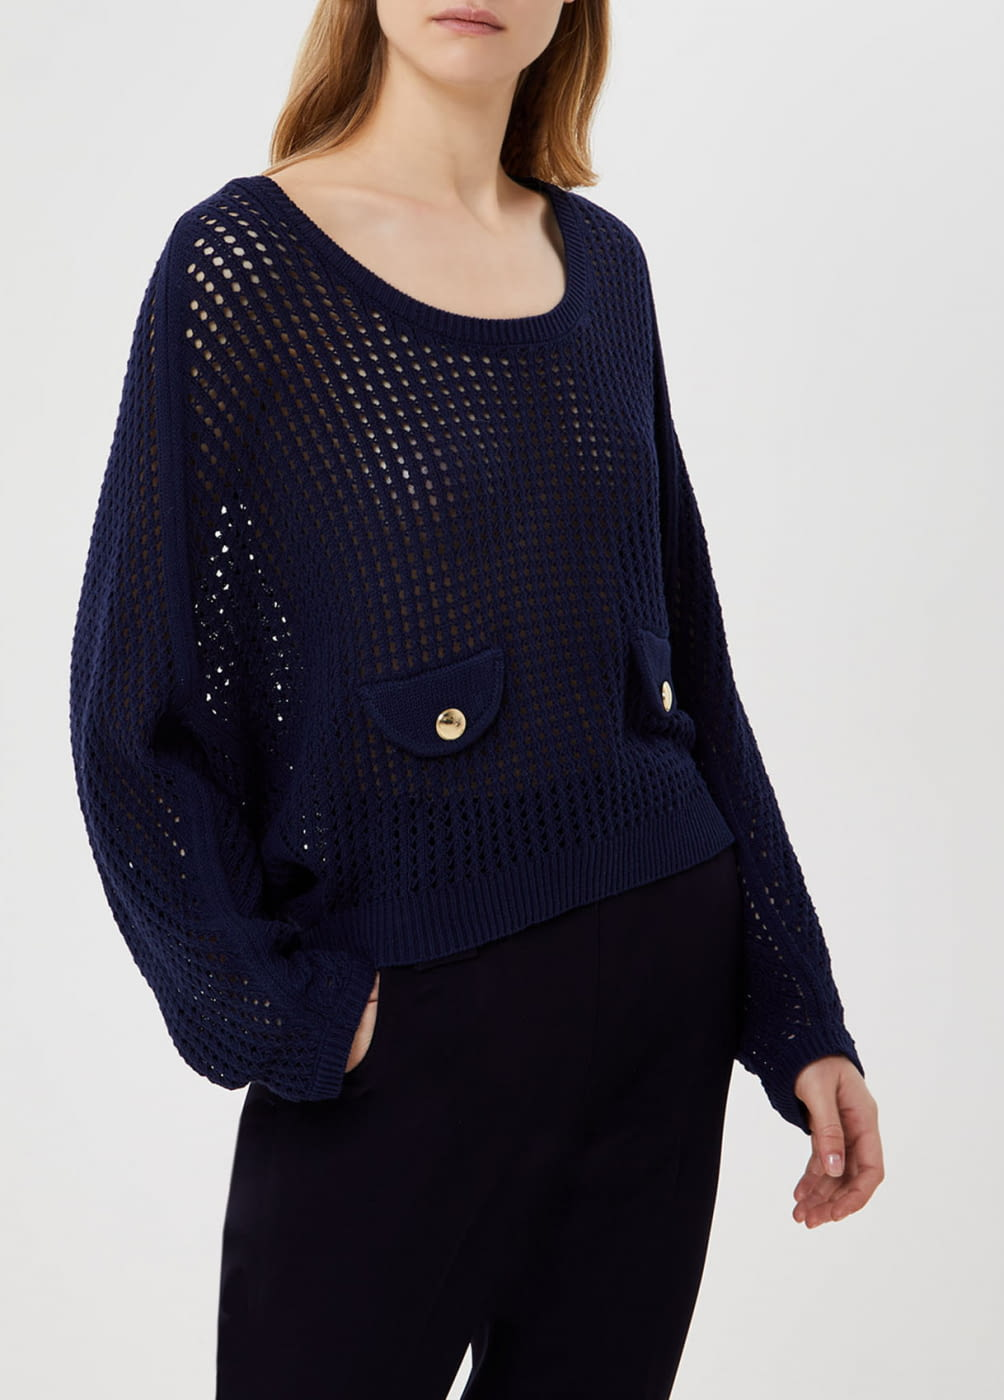 LIU·JO jersey crochet azul marino